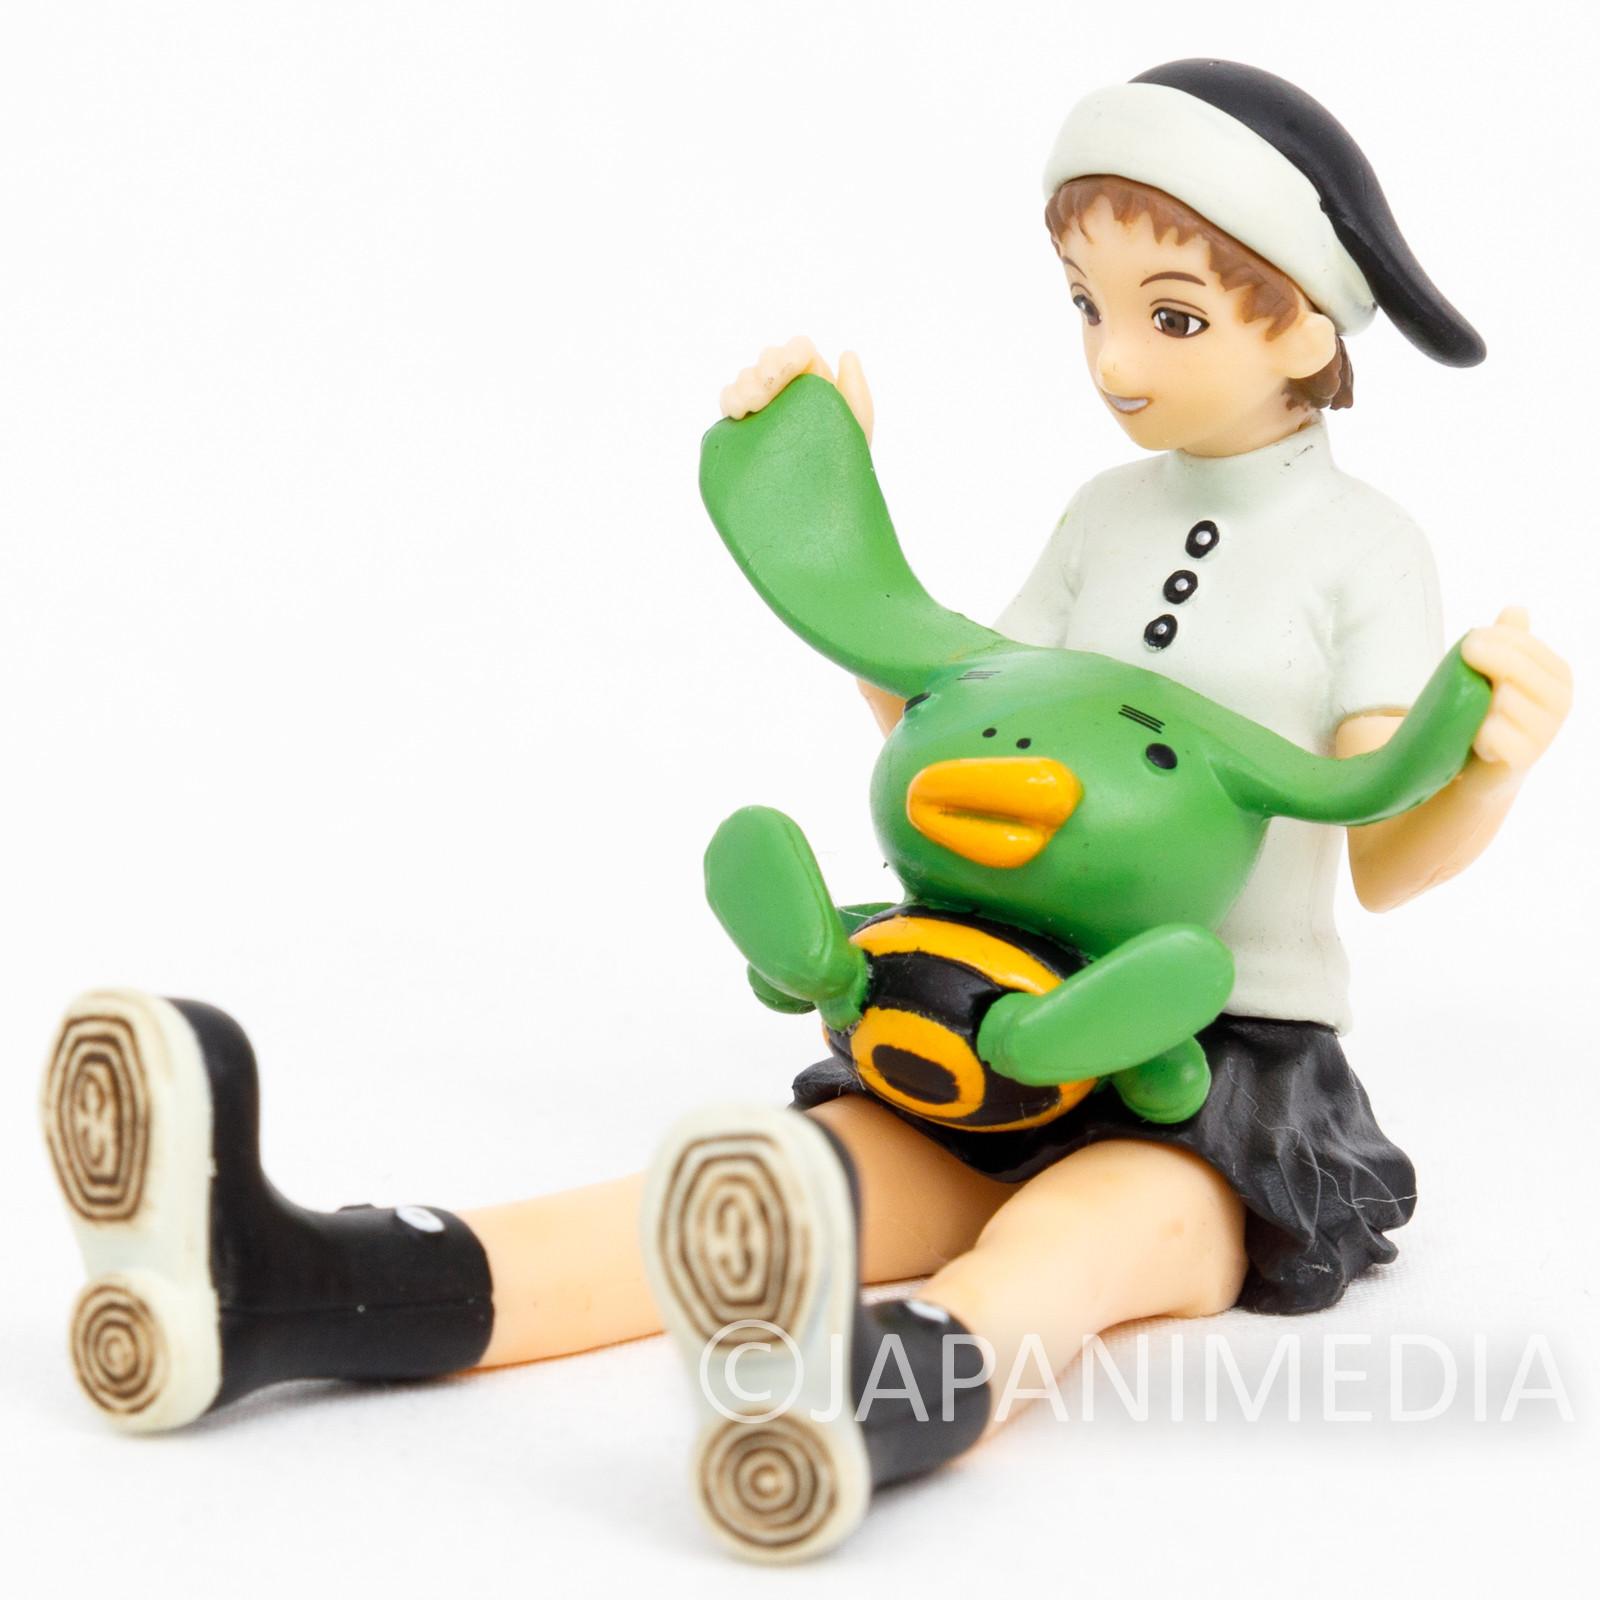 PSE #04 Solid Collection Range Murata Mini Figure Ver.1 JAPAN ANIME